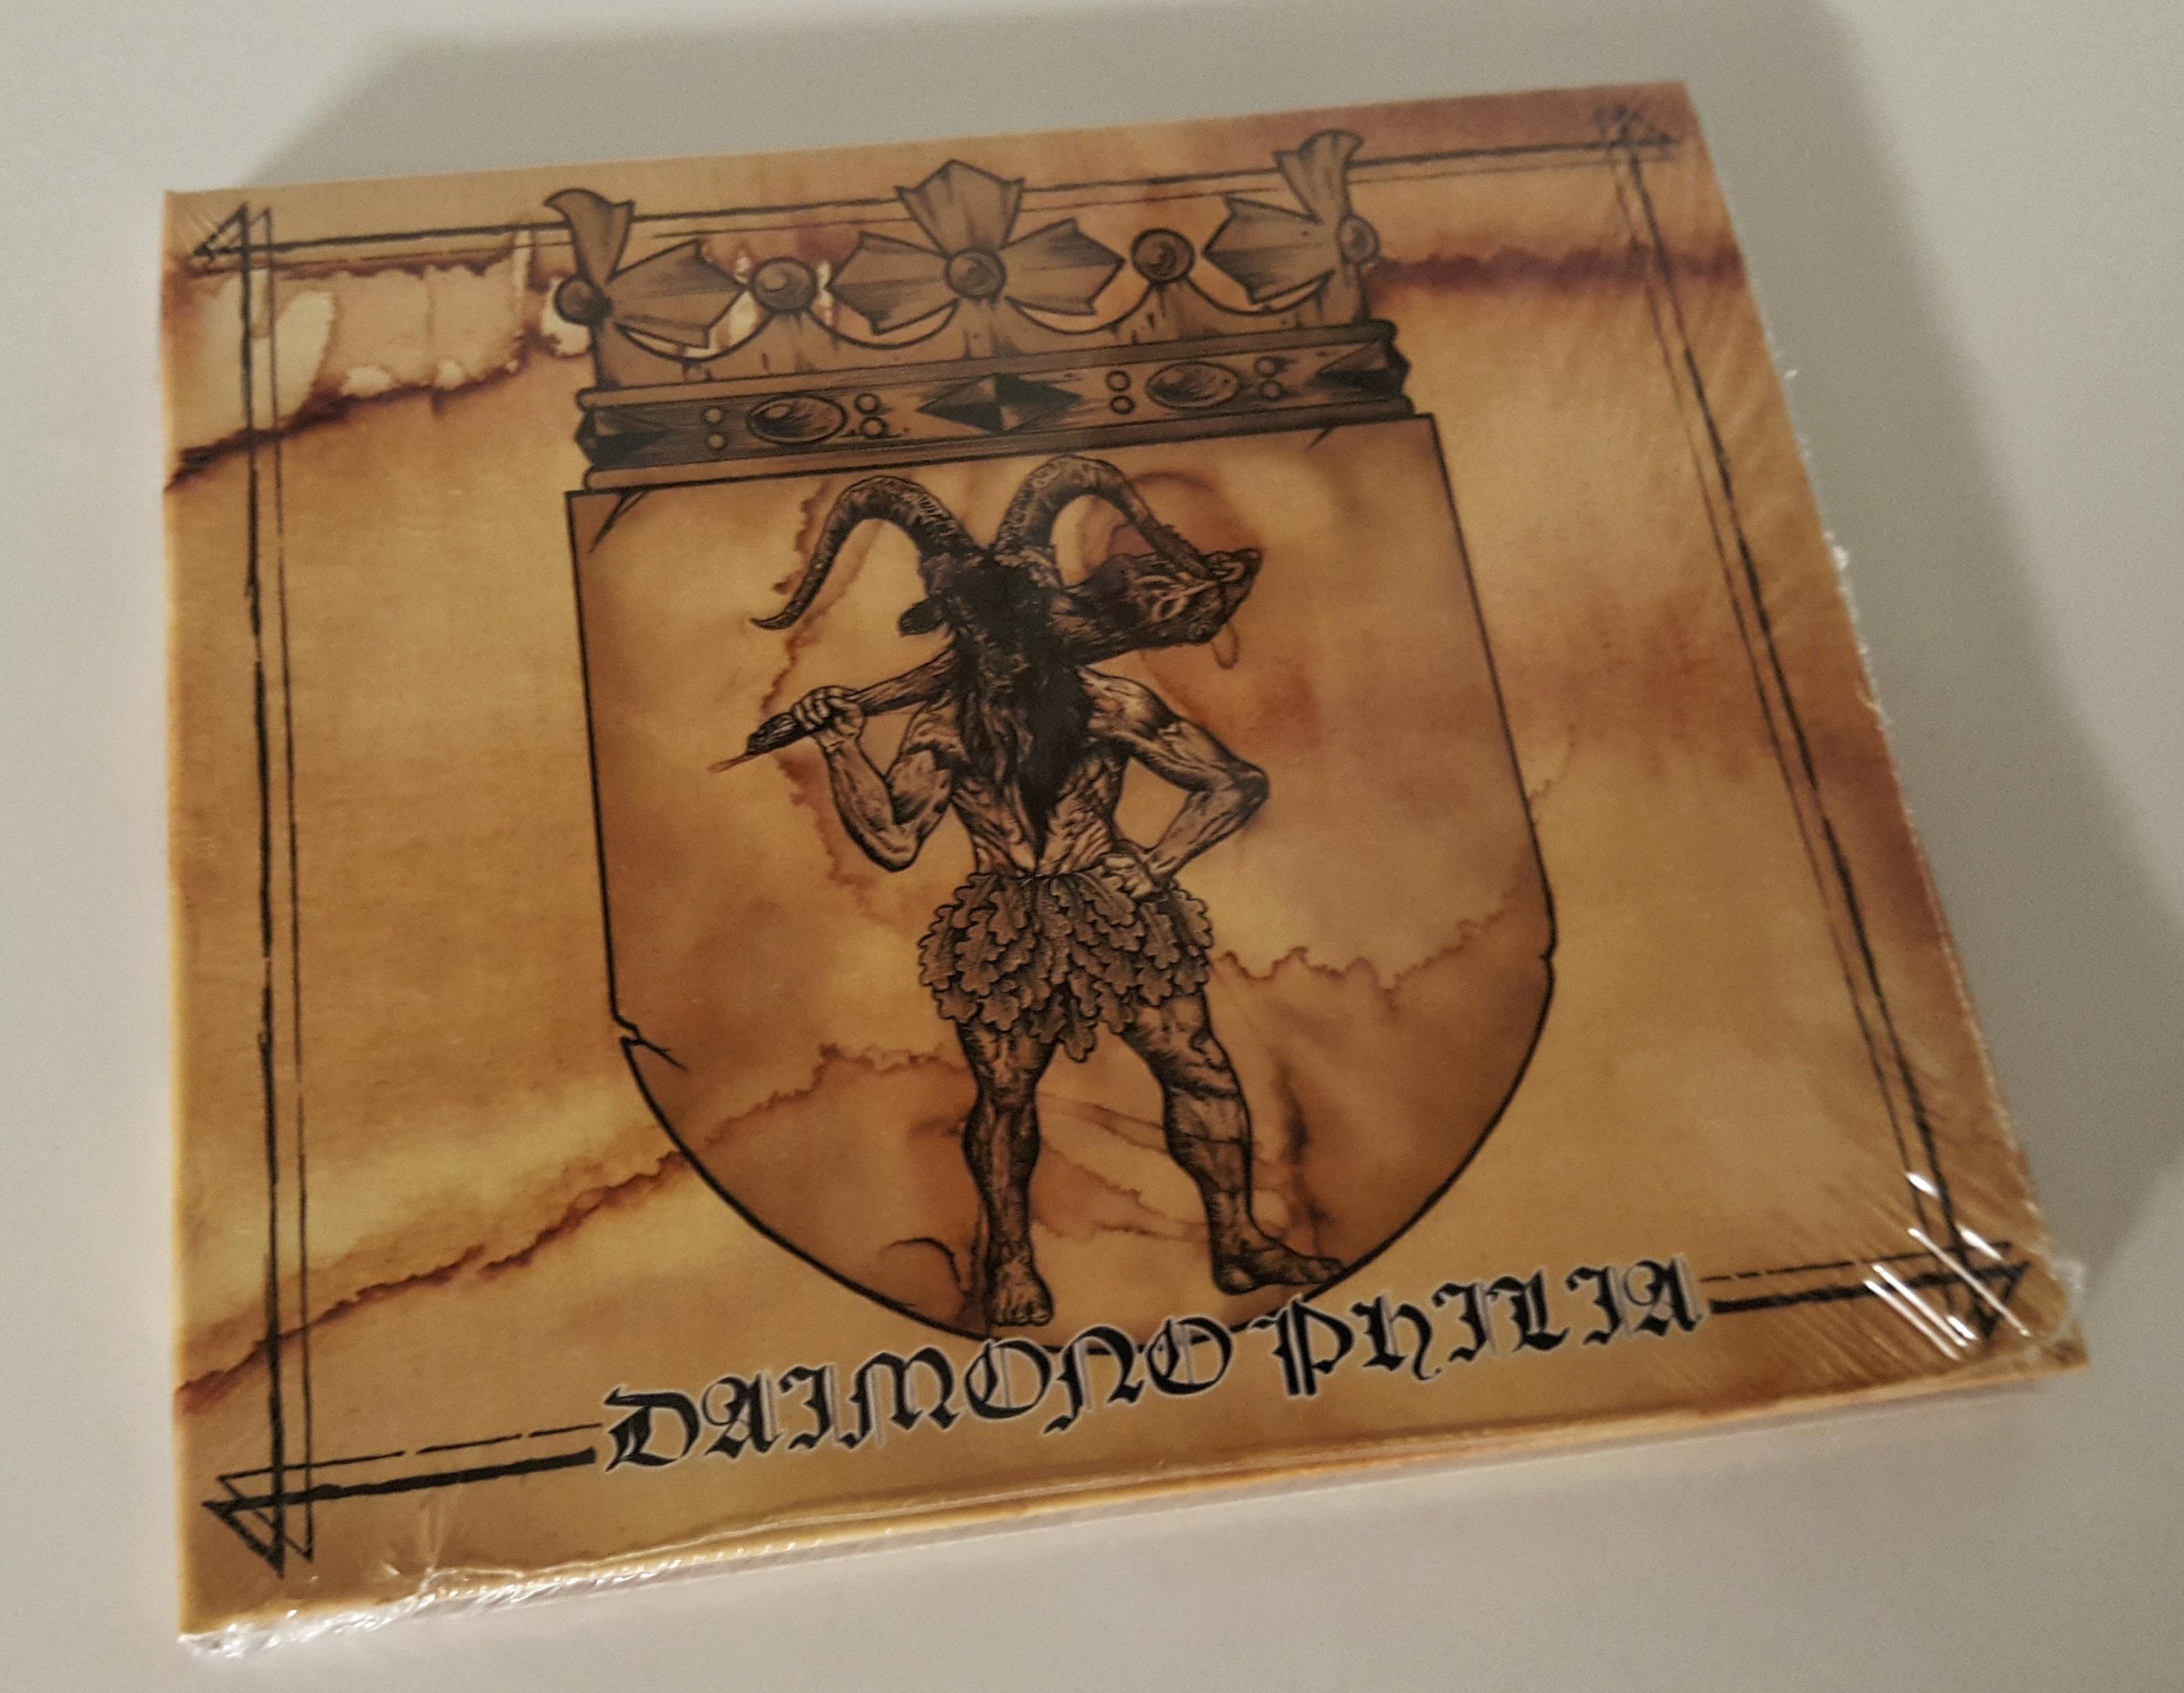 "LORD OF PAGATHORN - Daimono Philia CD & 12""LP"